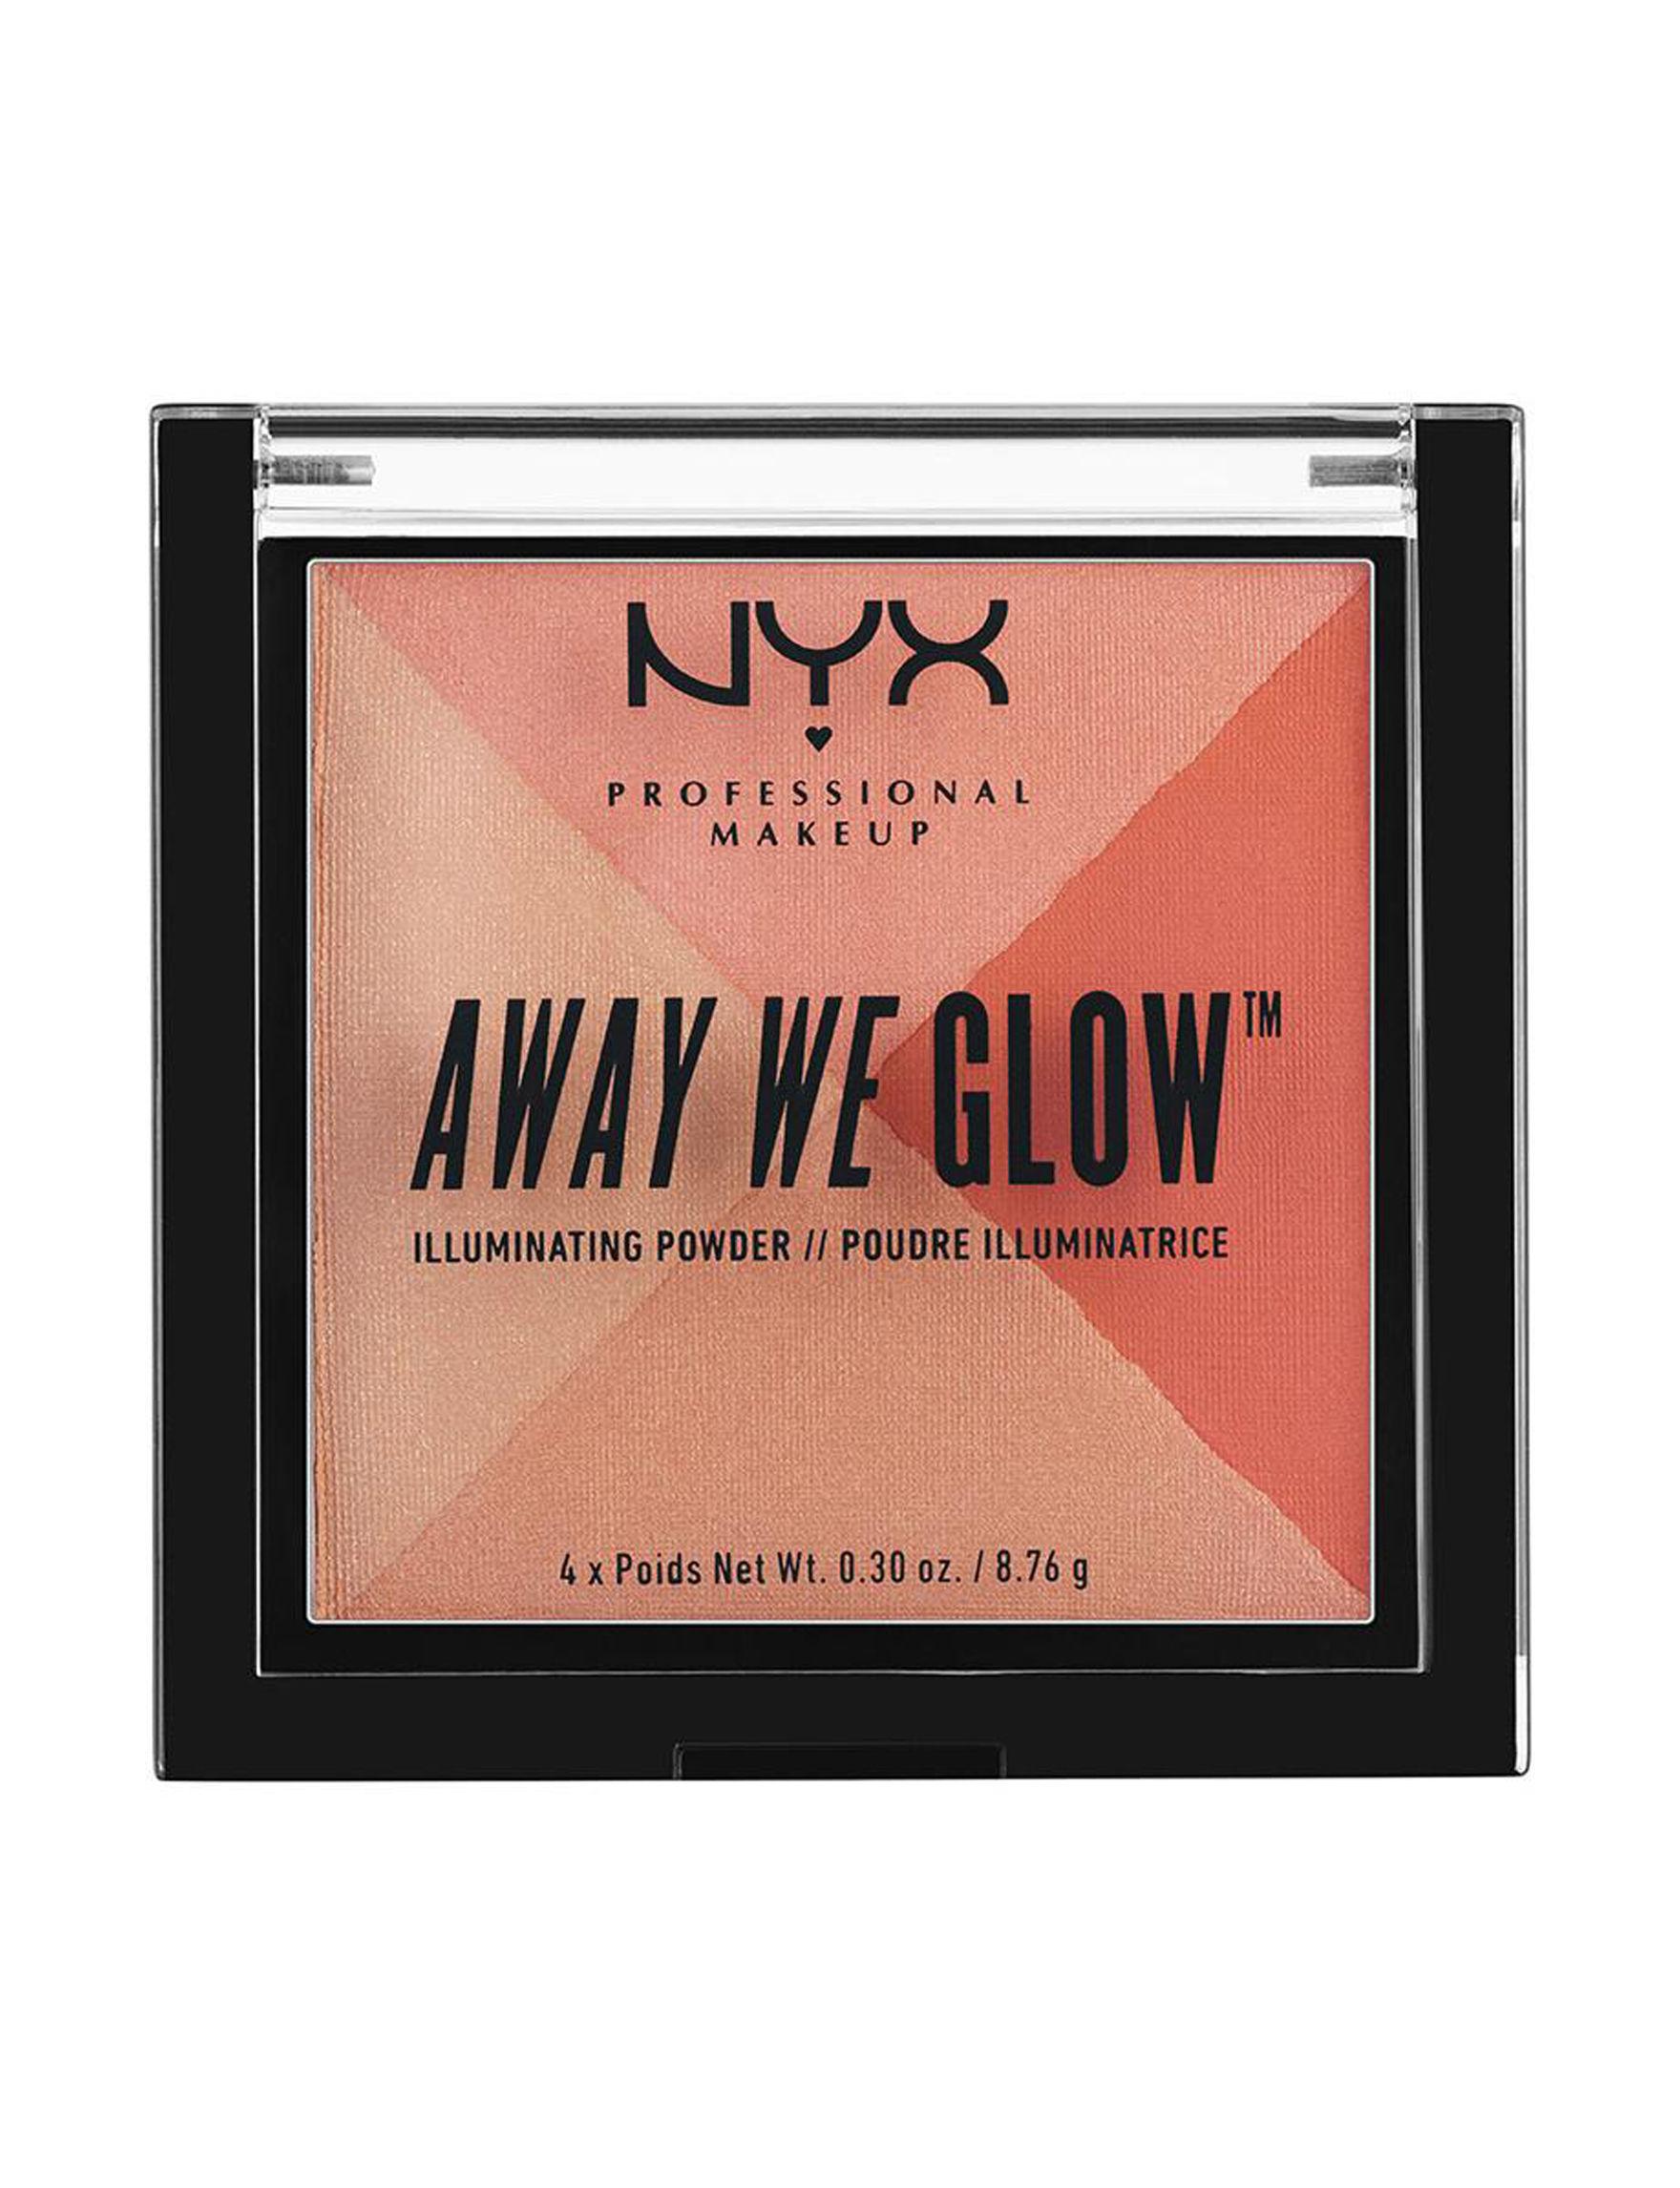 NYX Professional Makeup Summer Reflection Face Makeup Kits & Sets Highlighter